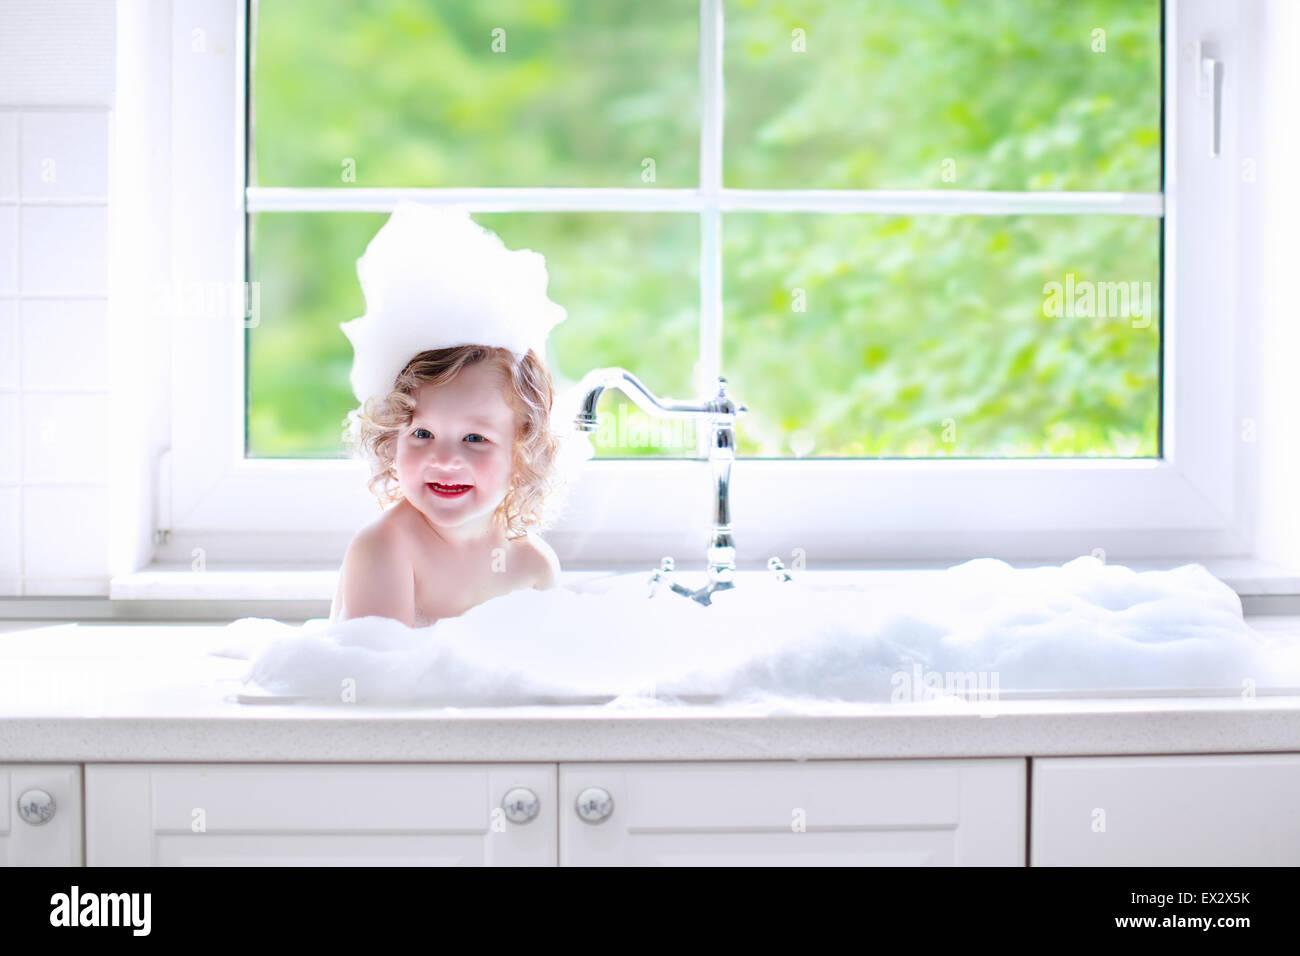 Child taking bath. Little baby in a kitchen sink washing hair with ...